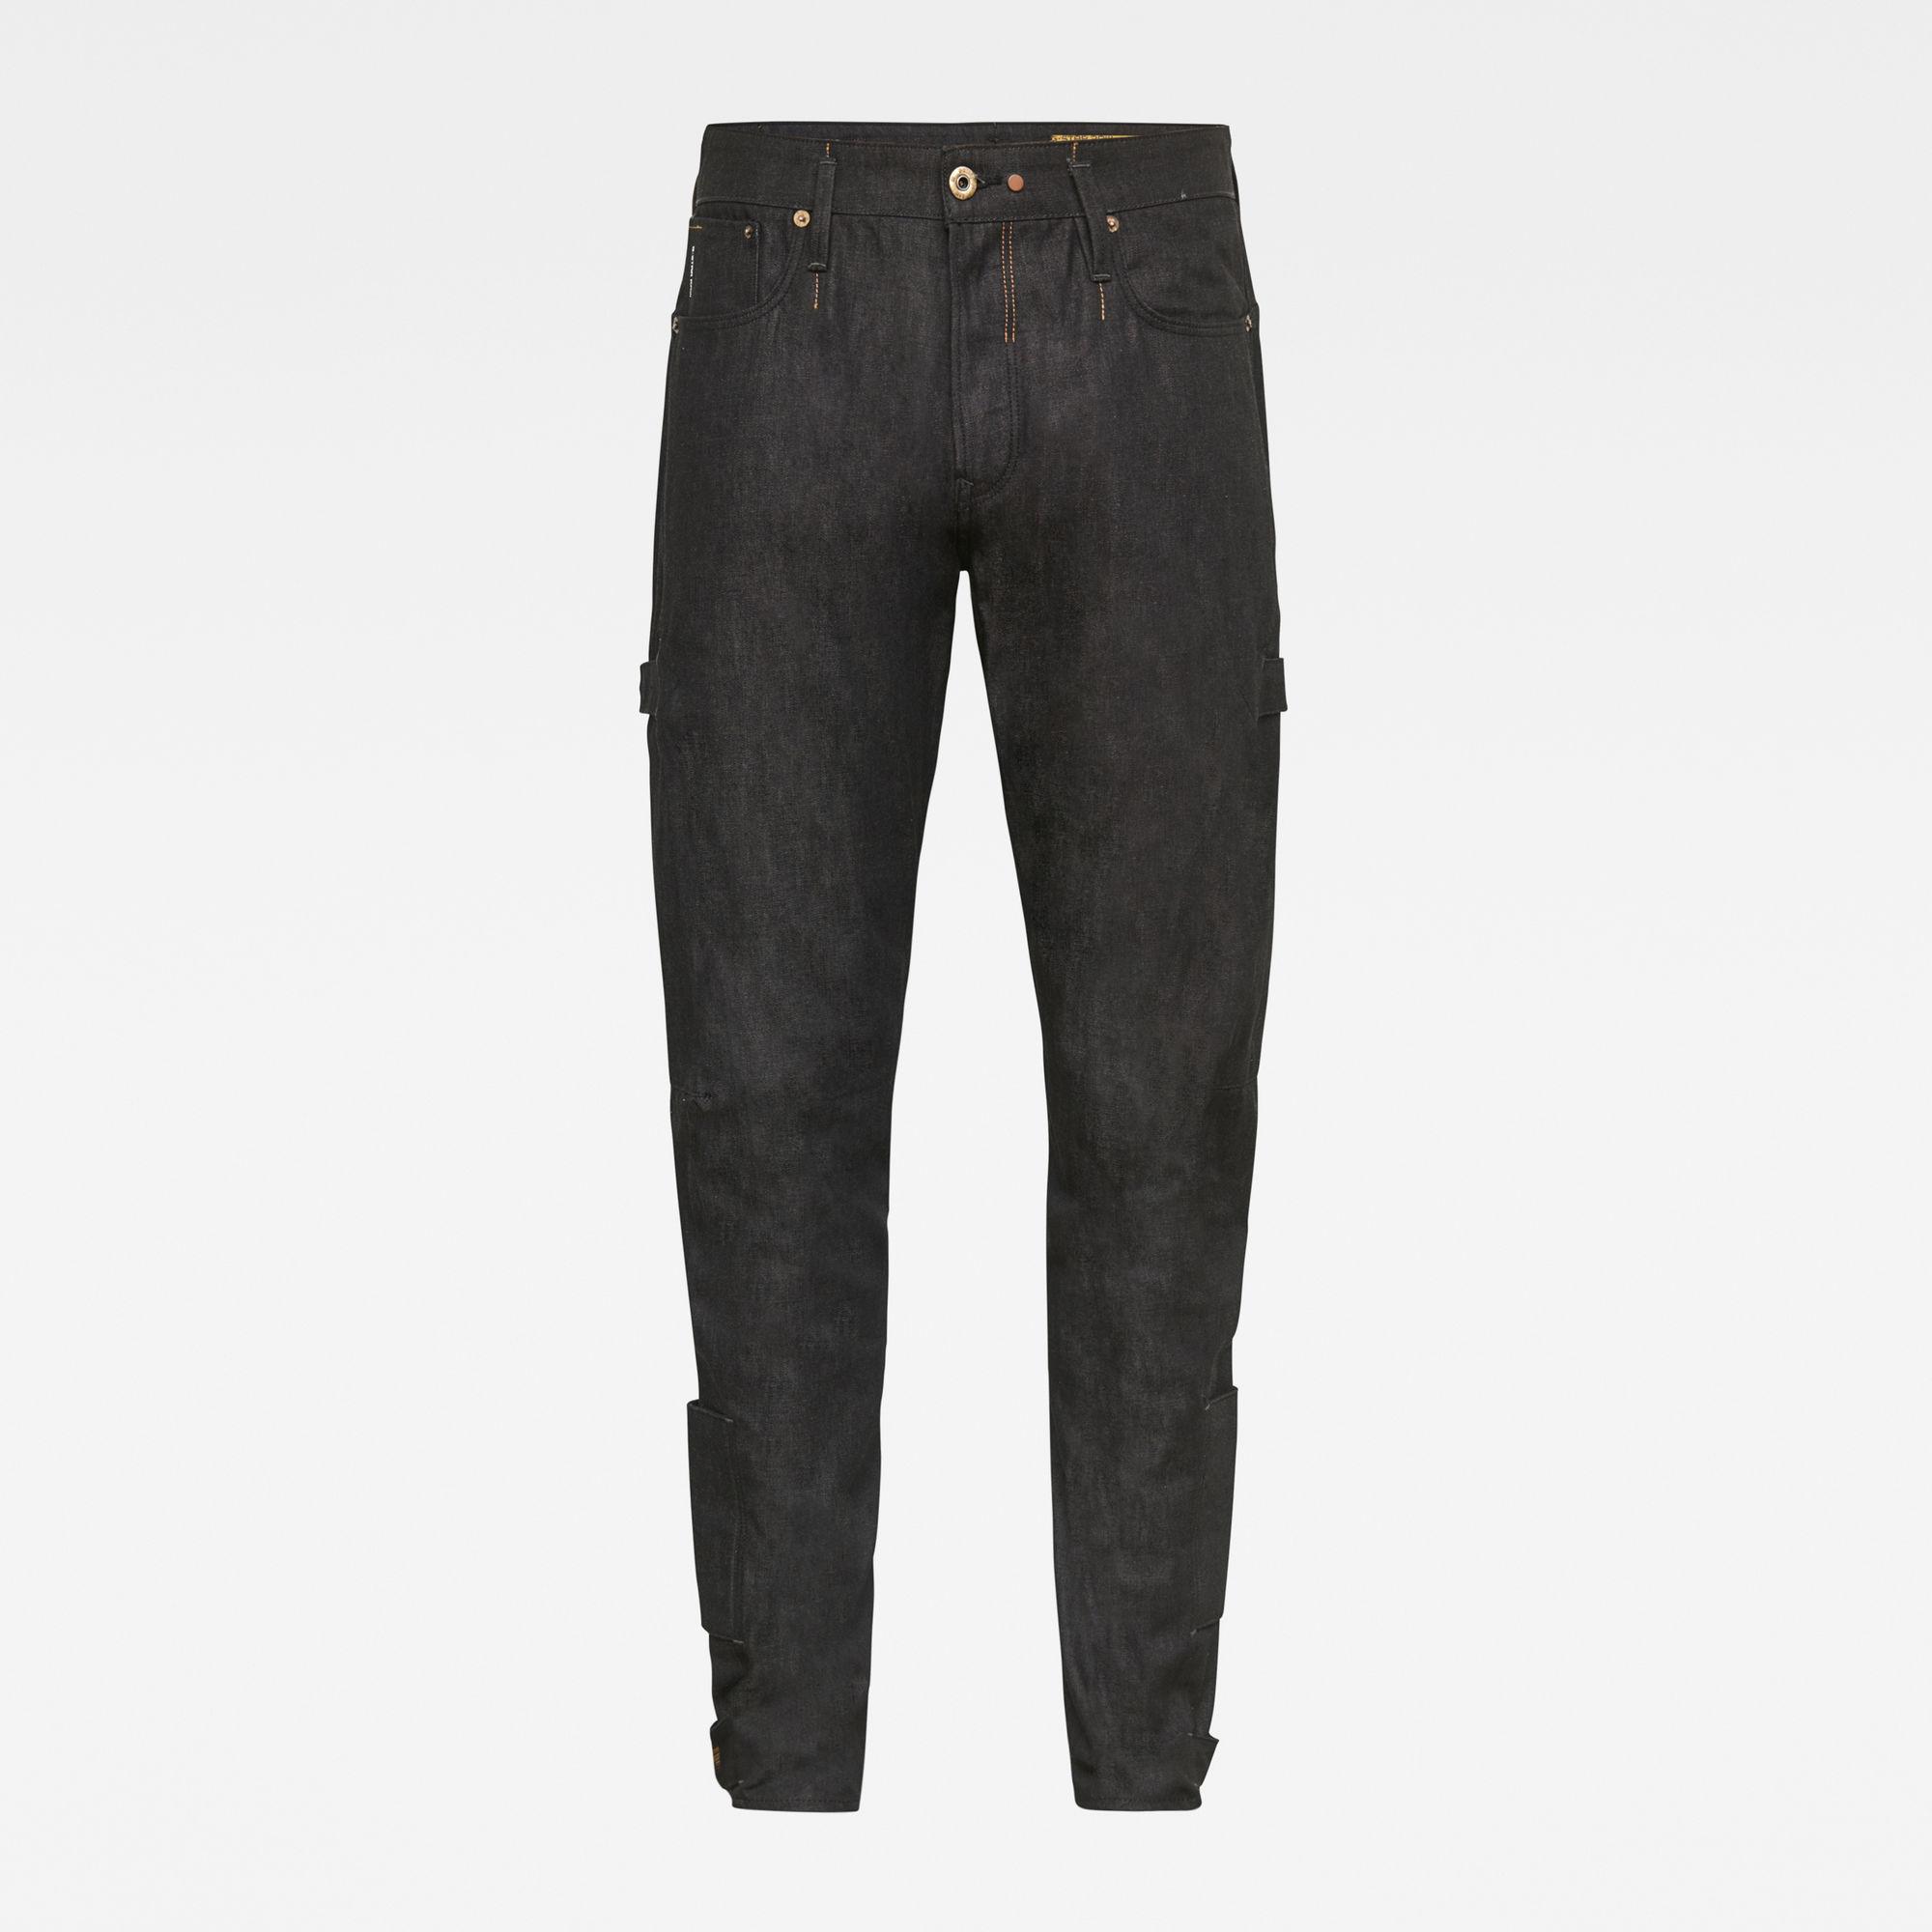 G-Star RAW Heren E Scutar 3D Slim Tapered Adjusters Jeans Zwart